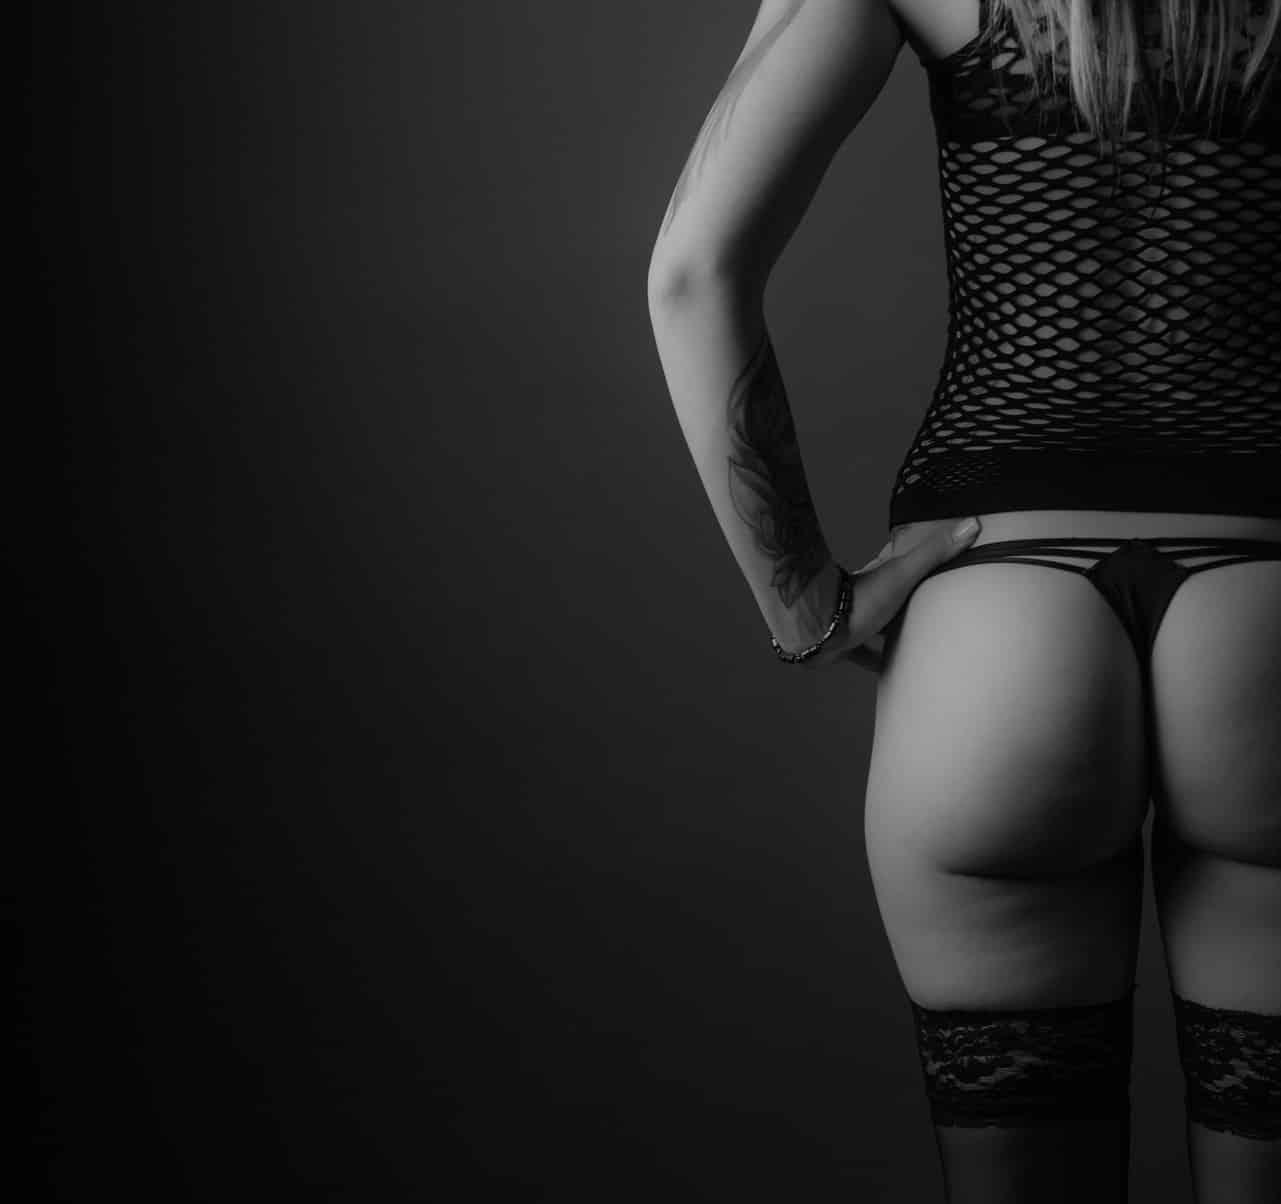 Erotisches Fotoshooting Mydays